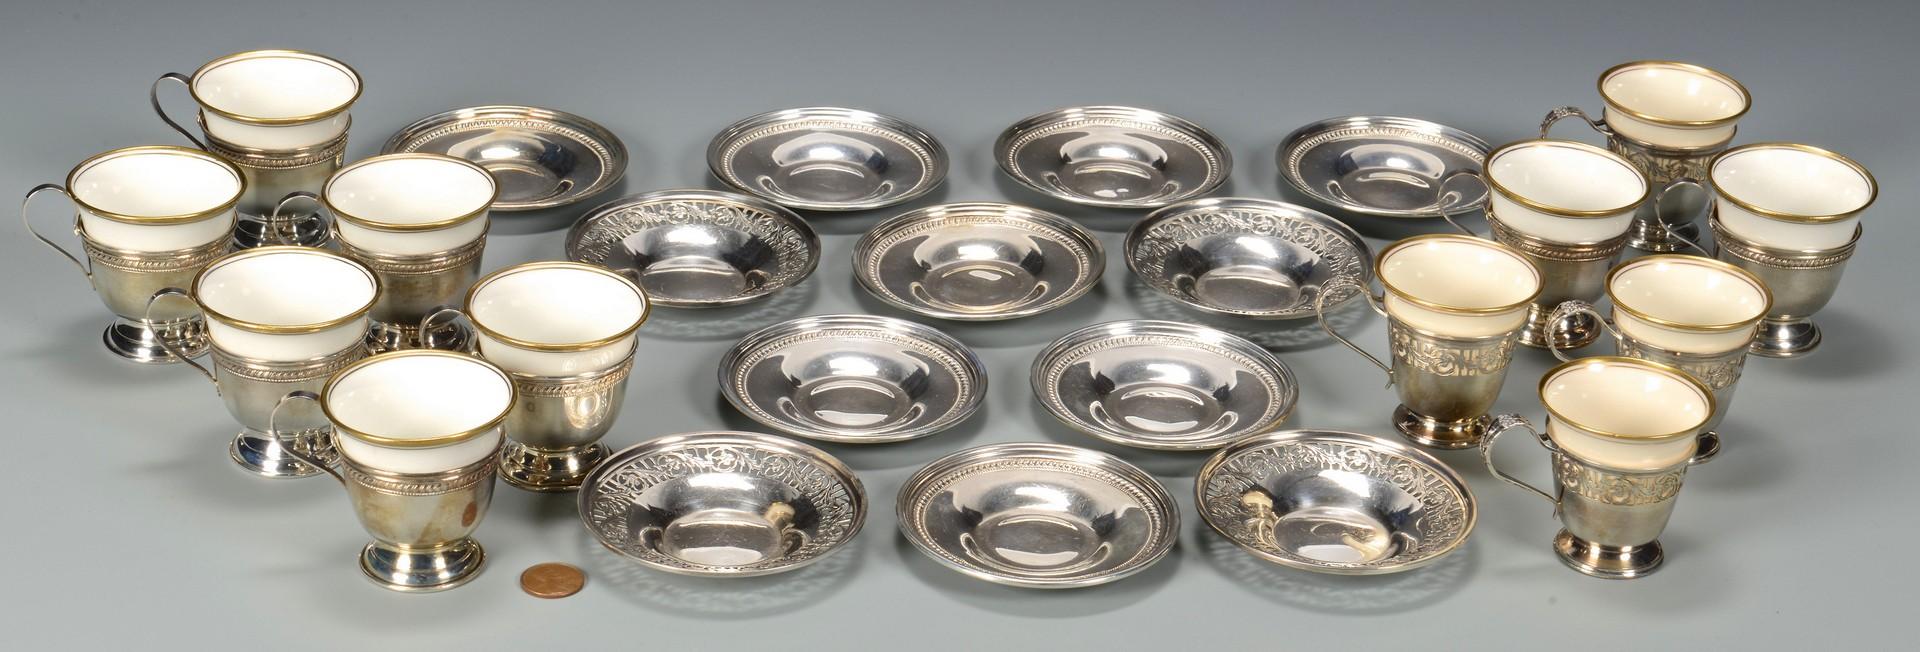 Lot 811: Sterling Demitasse Cups/Saucers